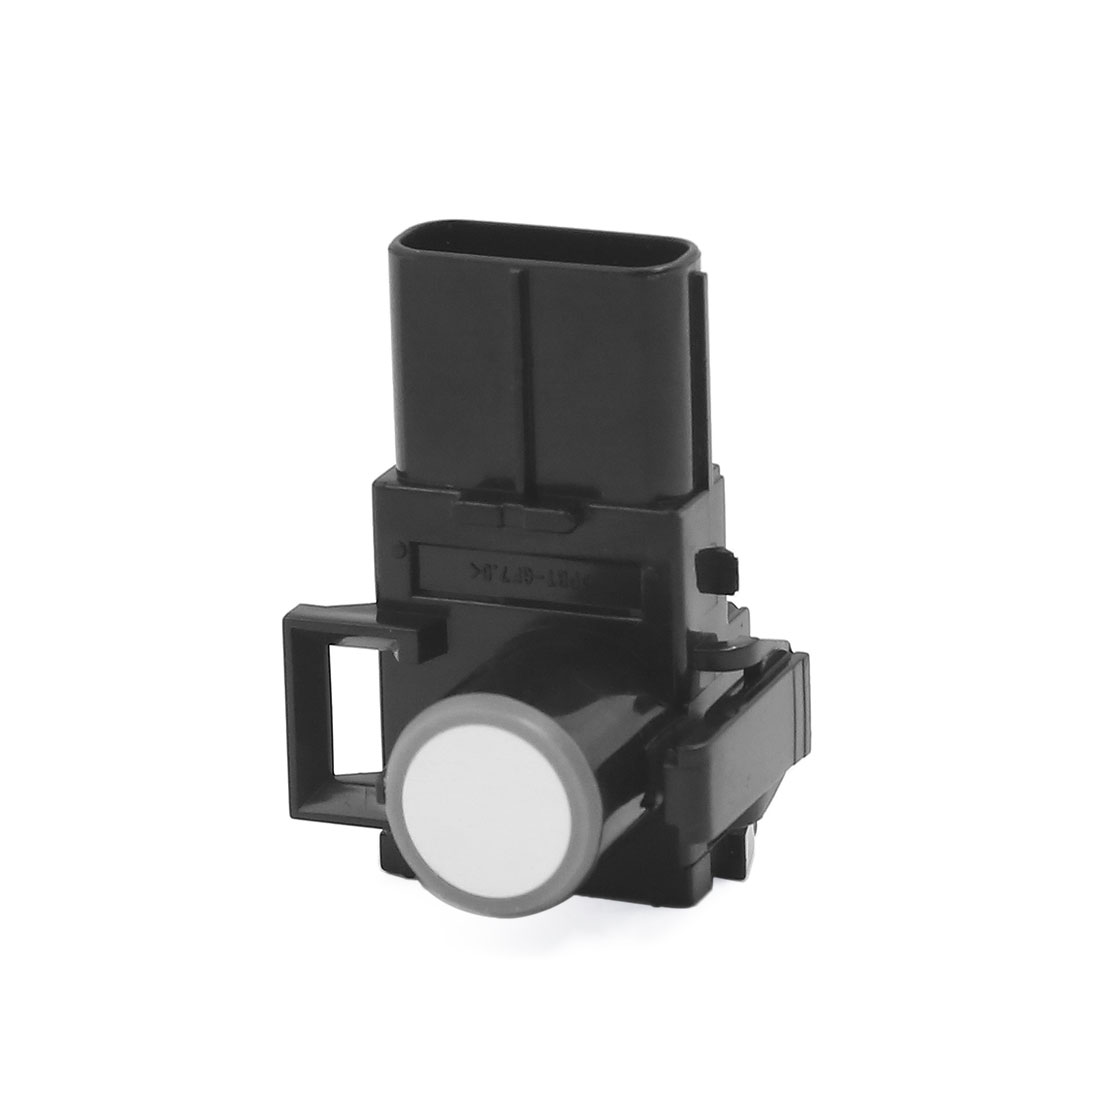 Corner Parking Ultrasonic Sensor for Camry Lexus LX570 RX350 RX450H 89341-33190